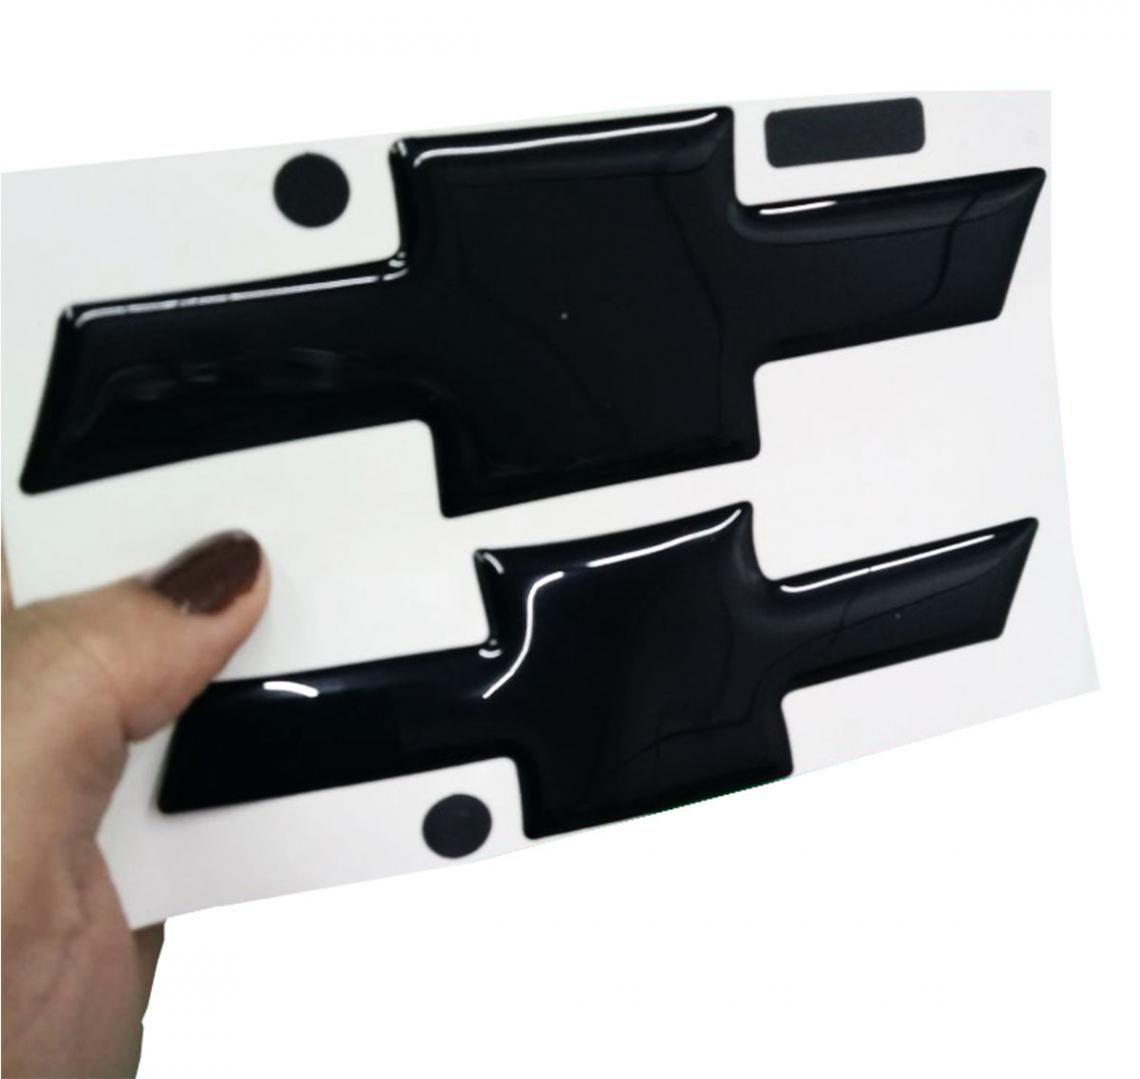 Gravata Adesiva Resinada Chevrolet Spin 2018 Black Piano